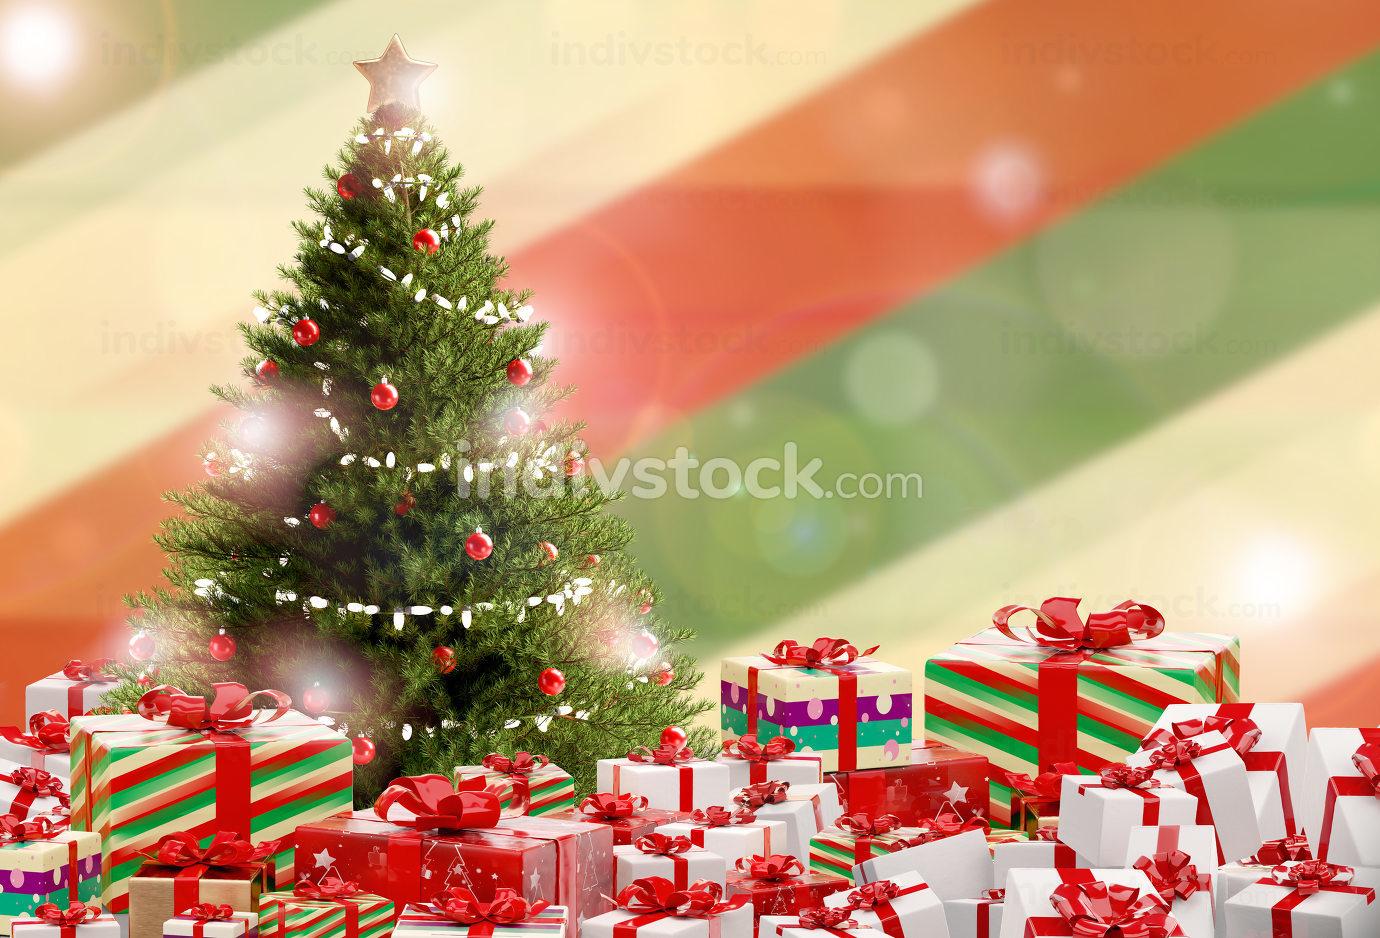 free download: Christmas gifts festive presents design 3d-illustration